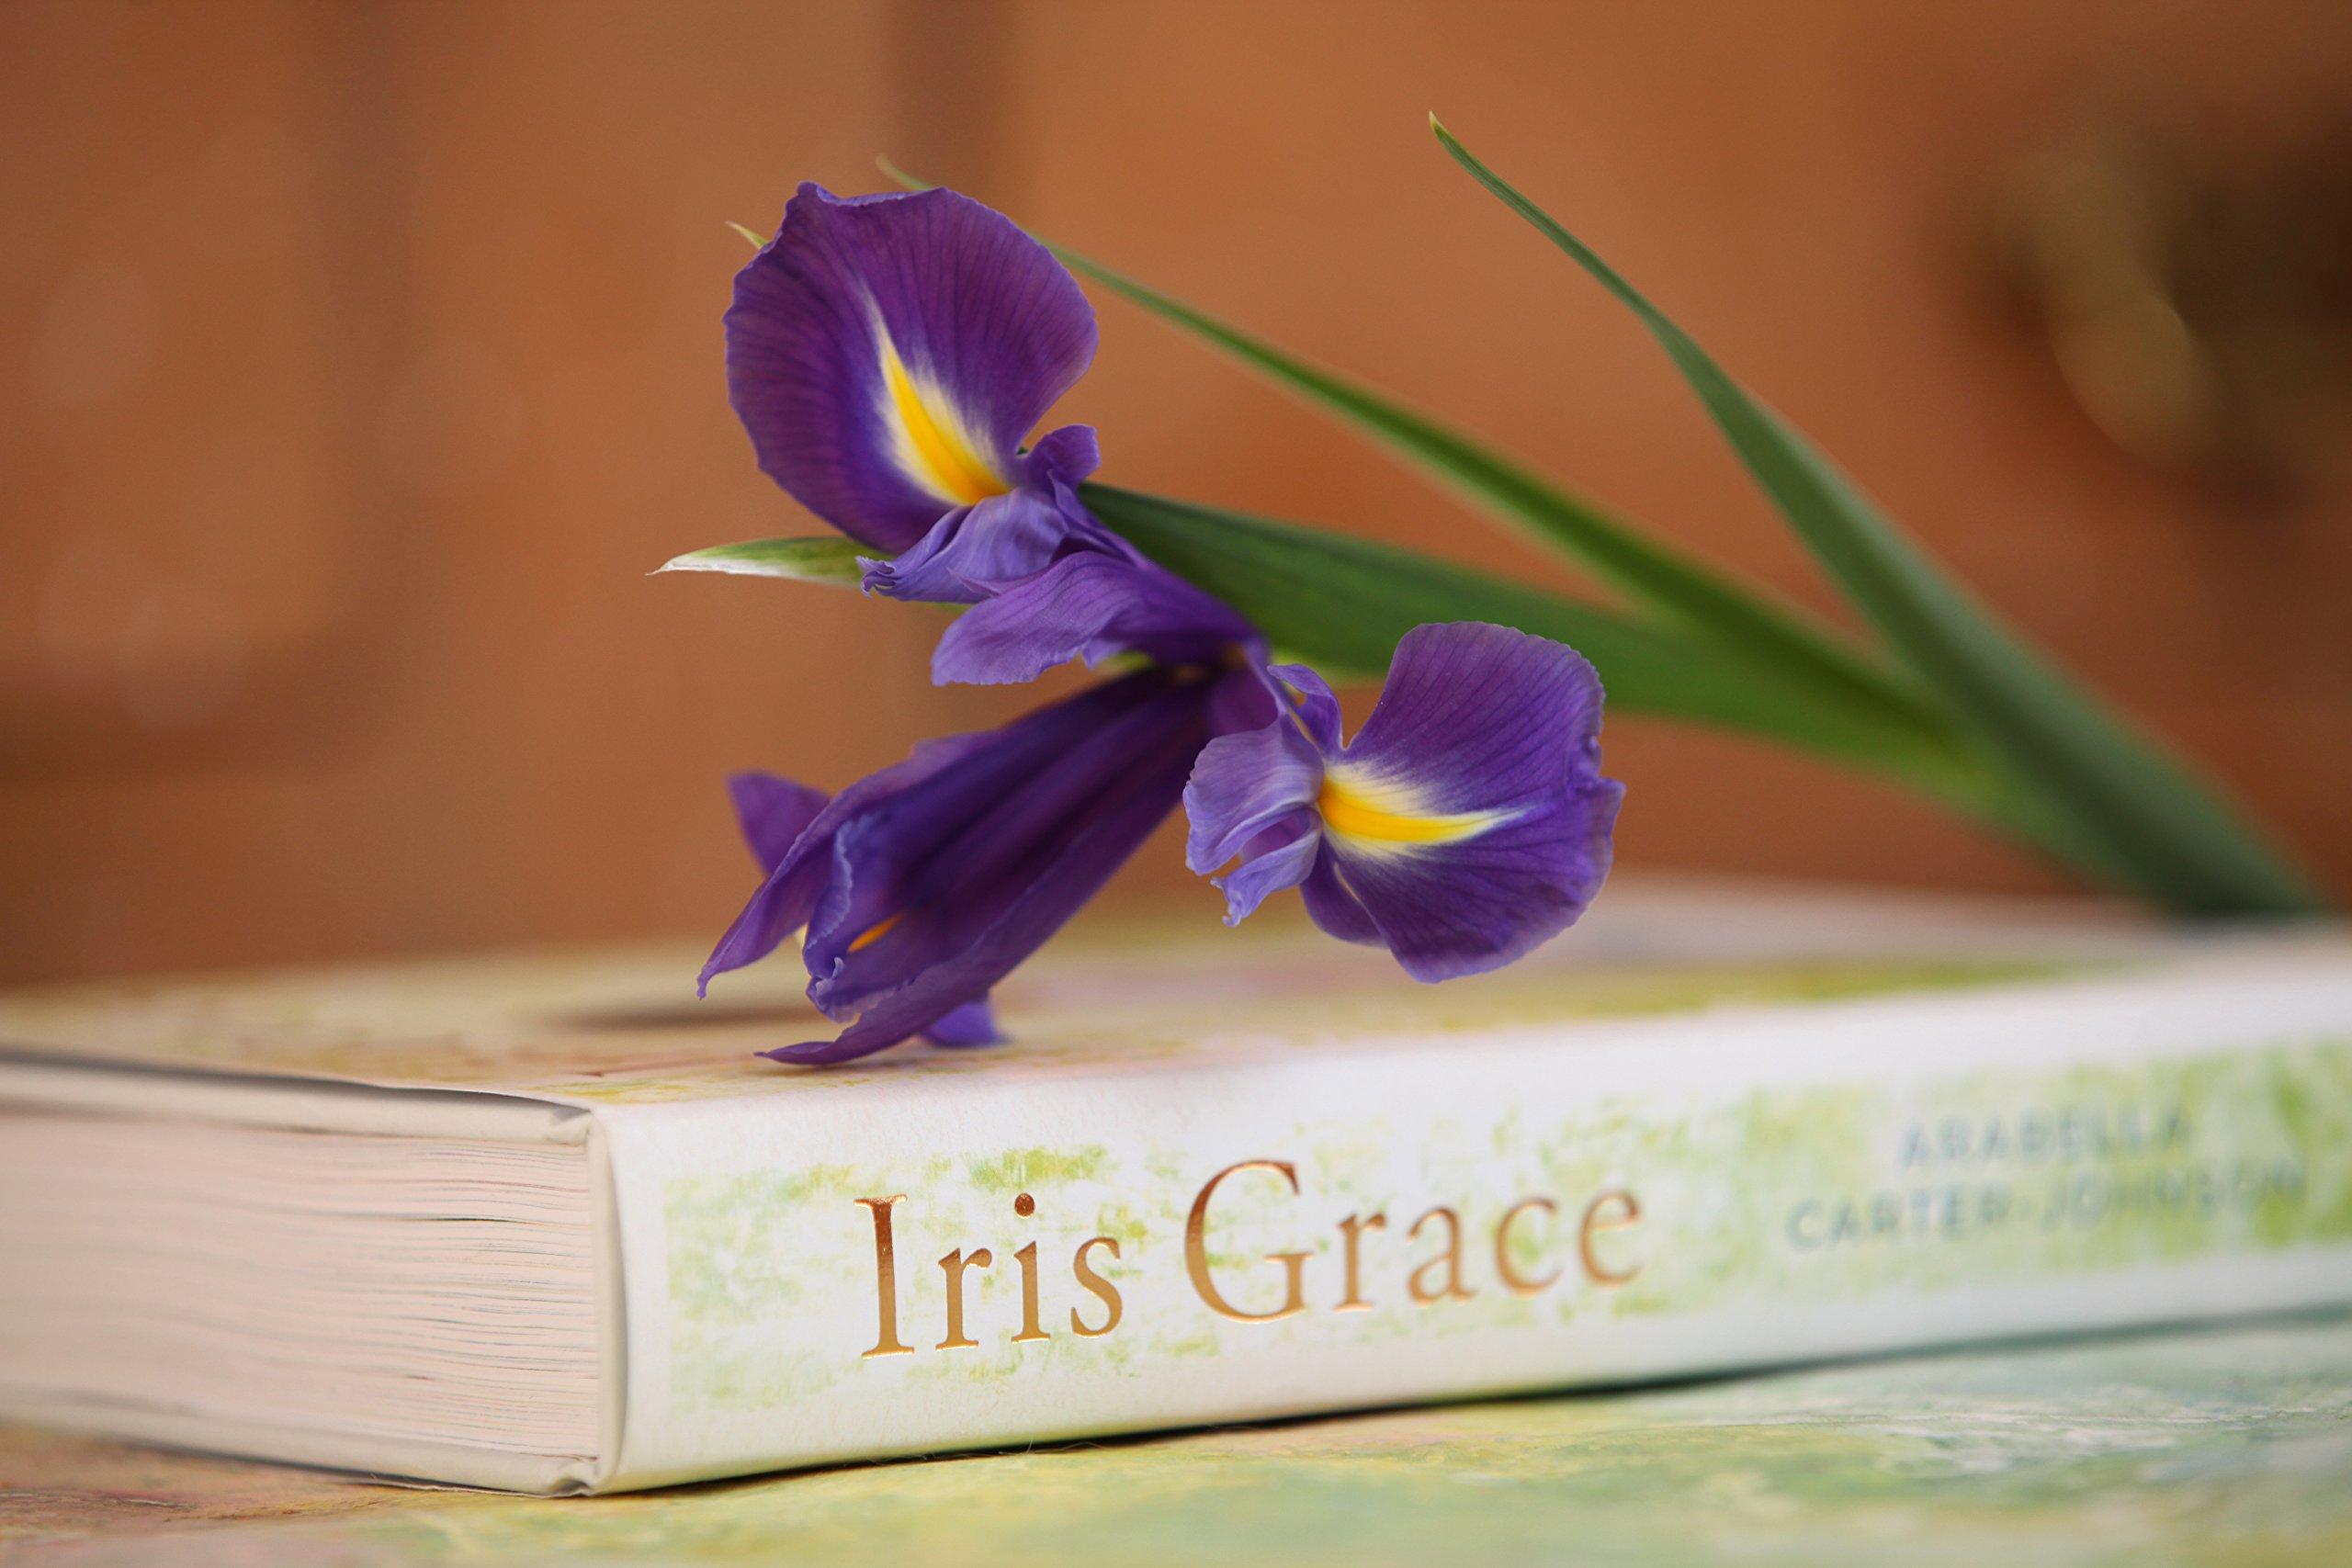 amazon iris grace arabella carter johnson autism asperger s